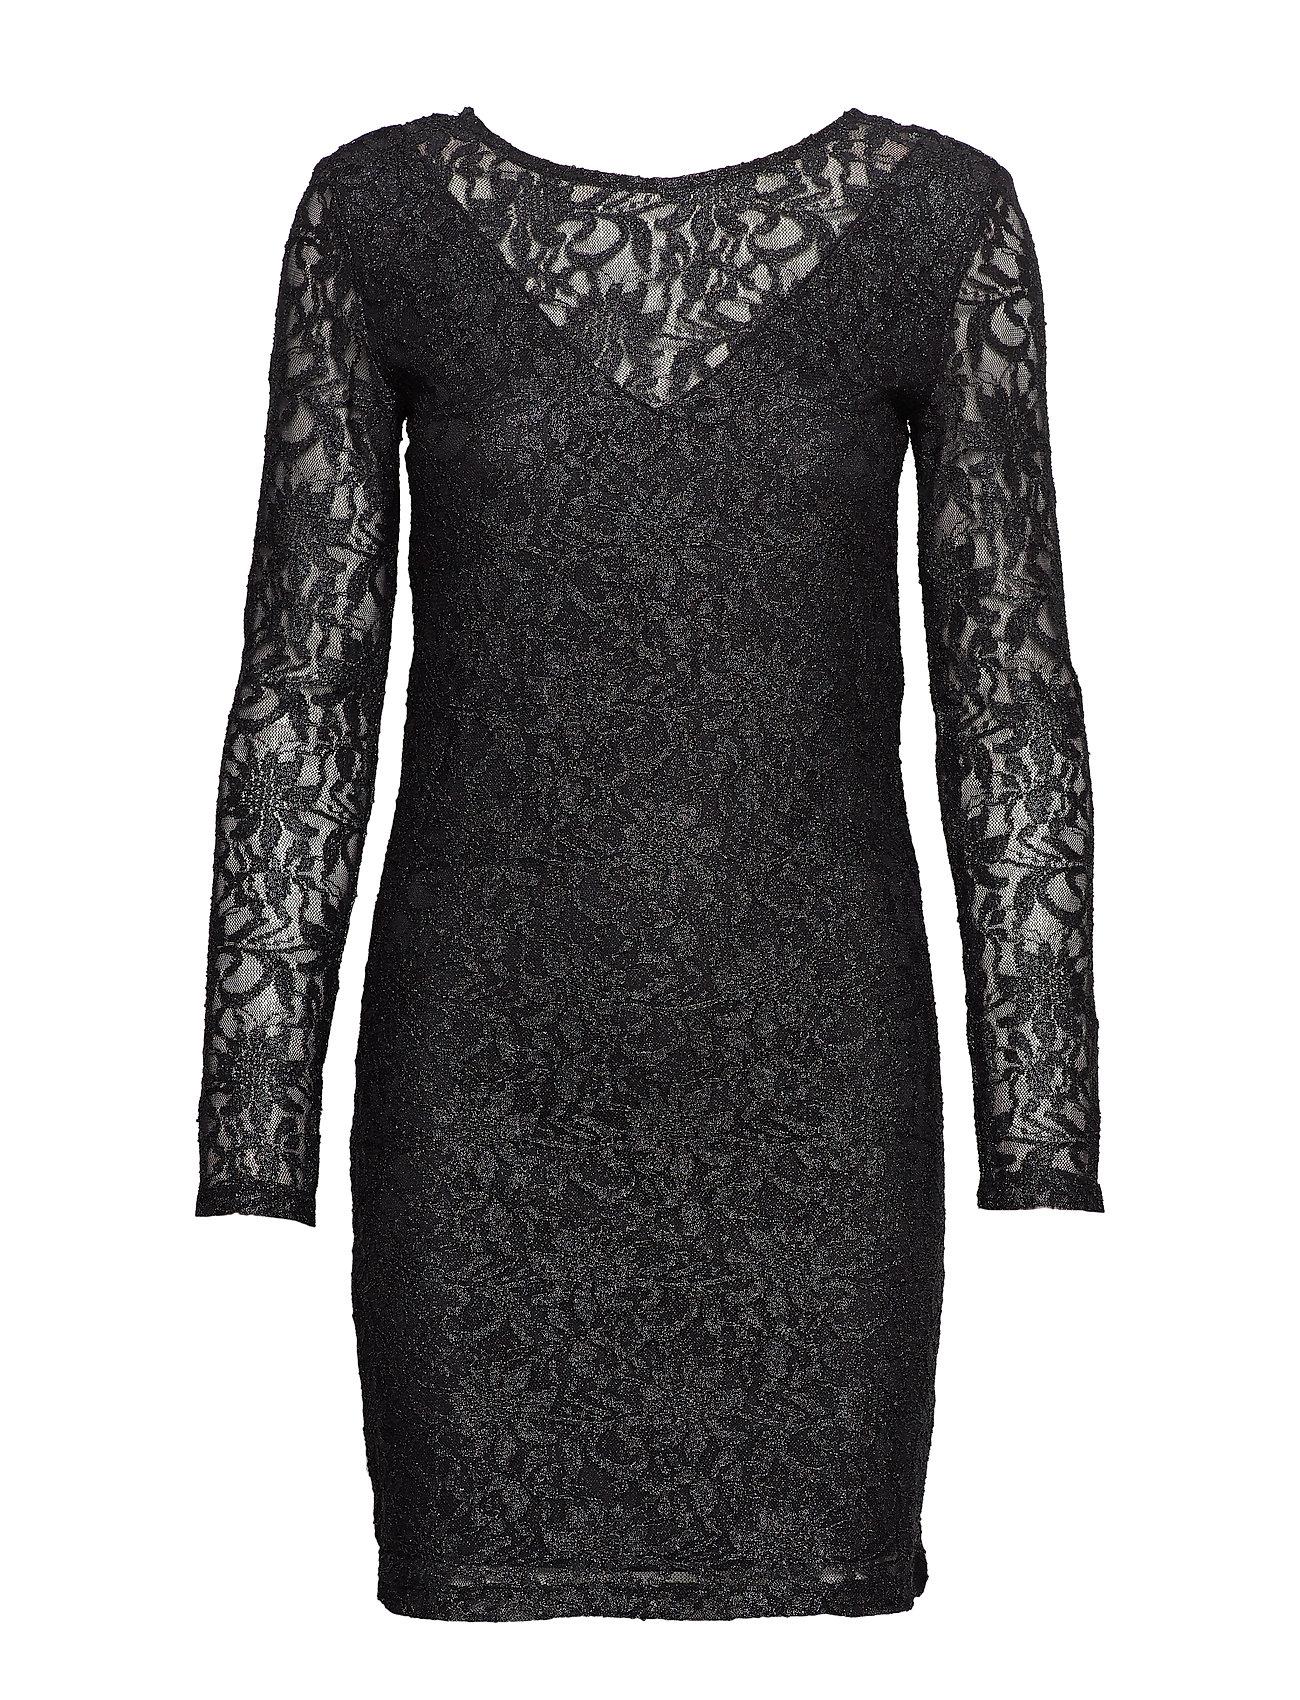 Vila VIVISTIN L/S DRESS/KI - BLACK